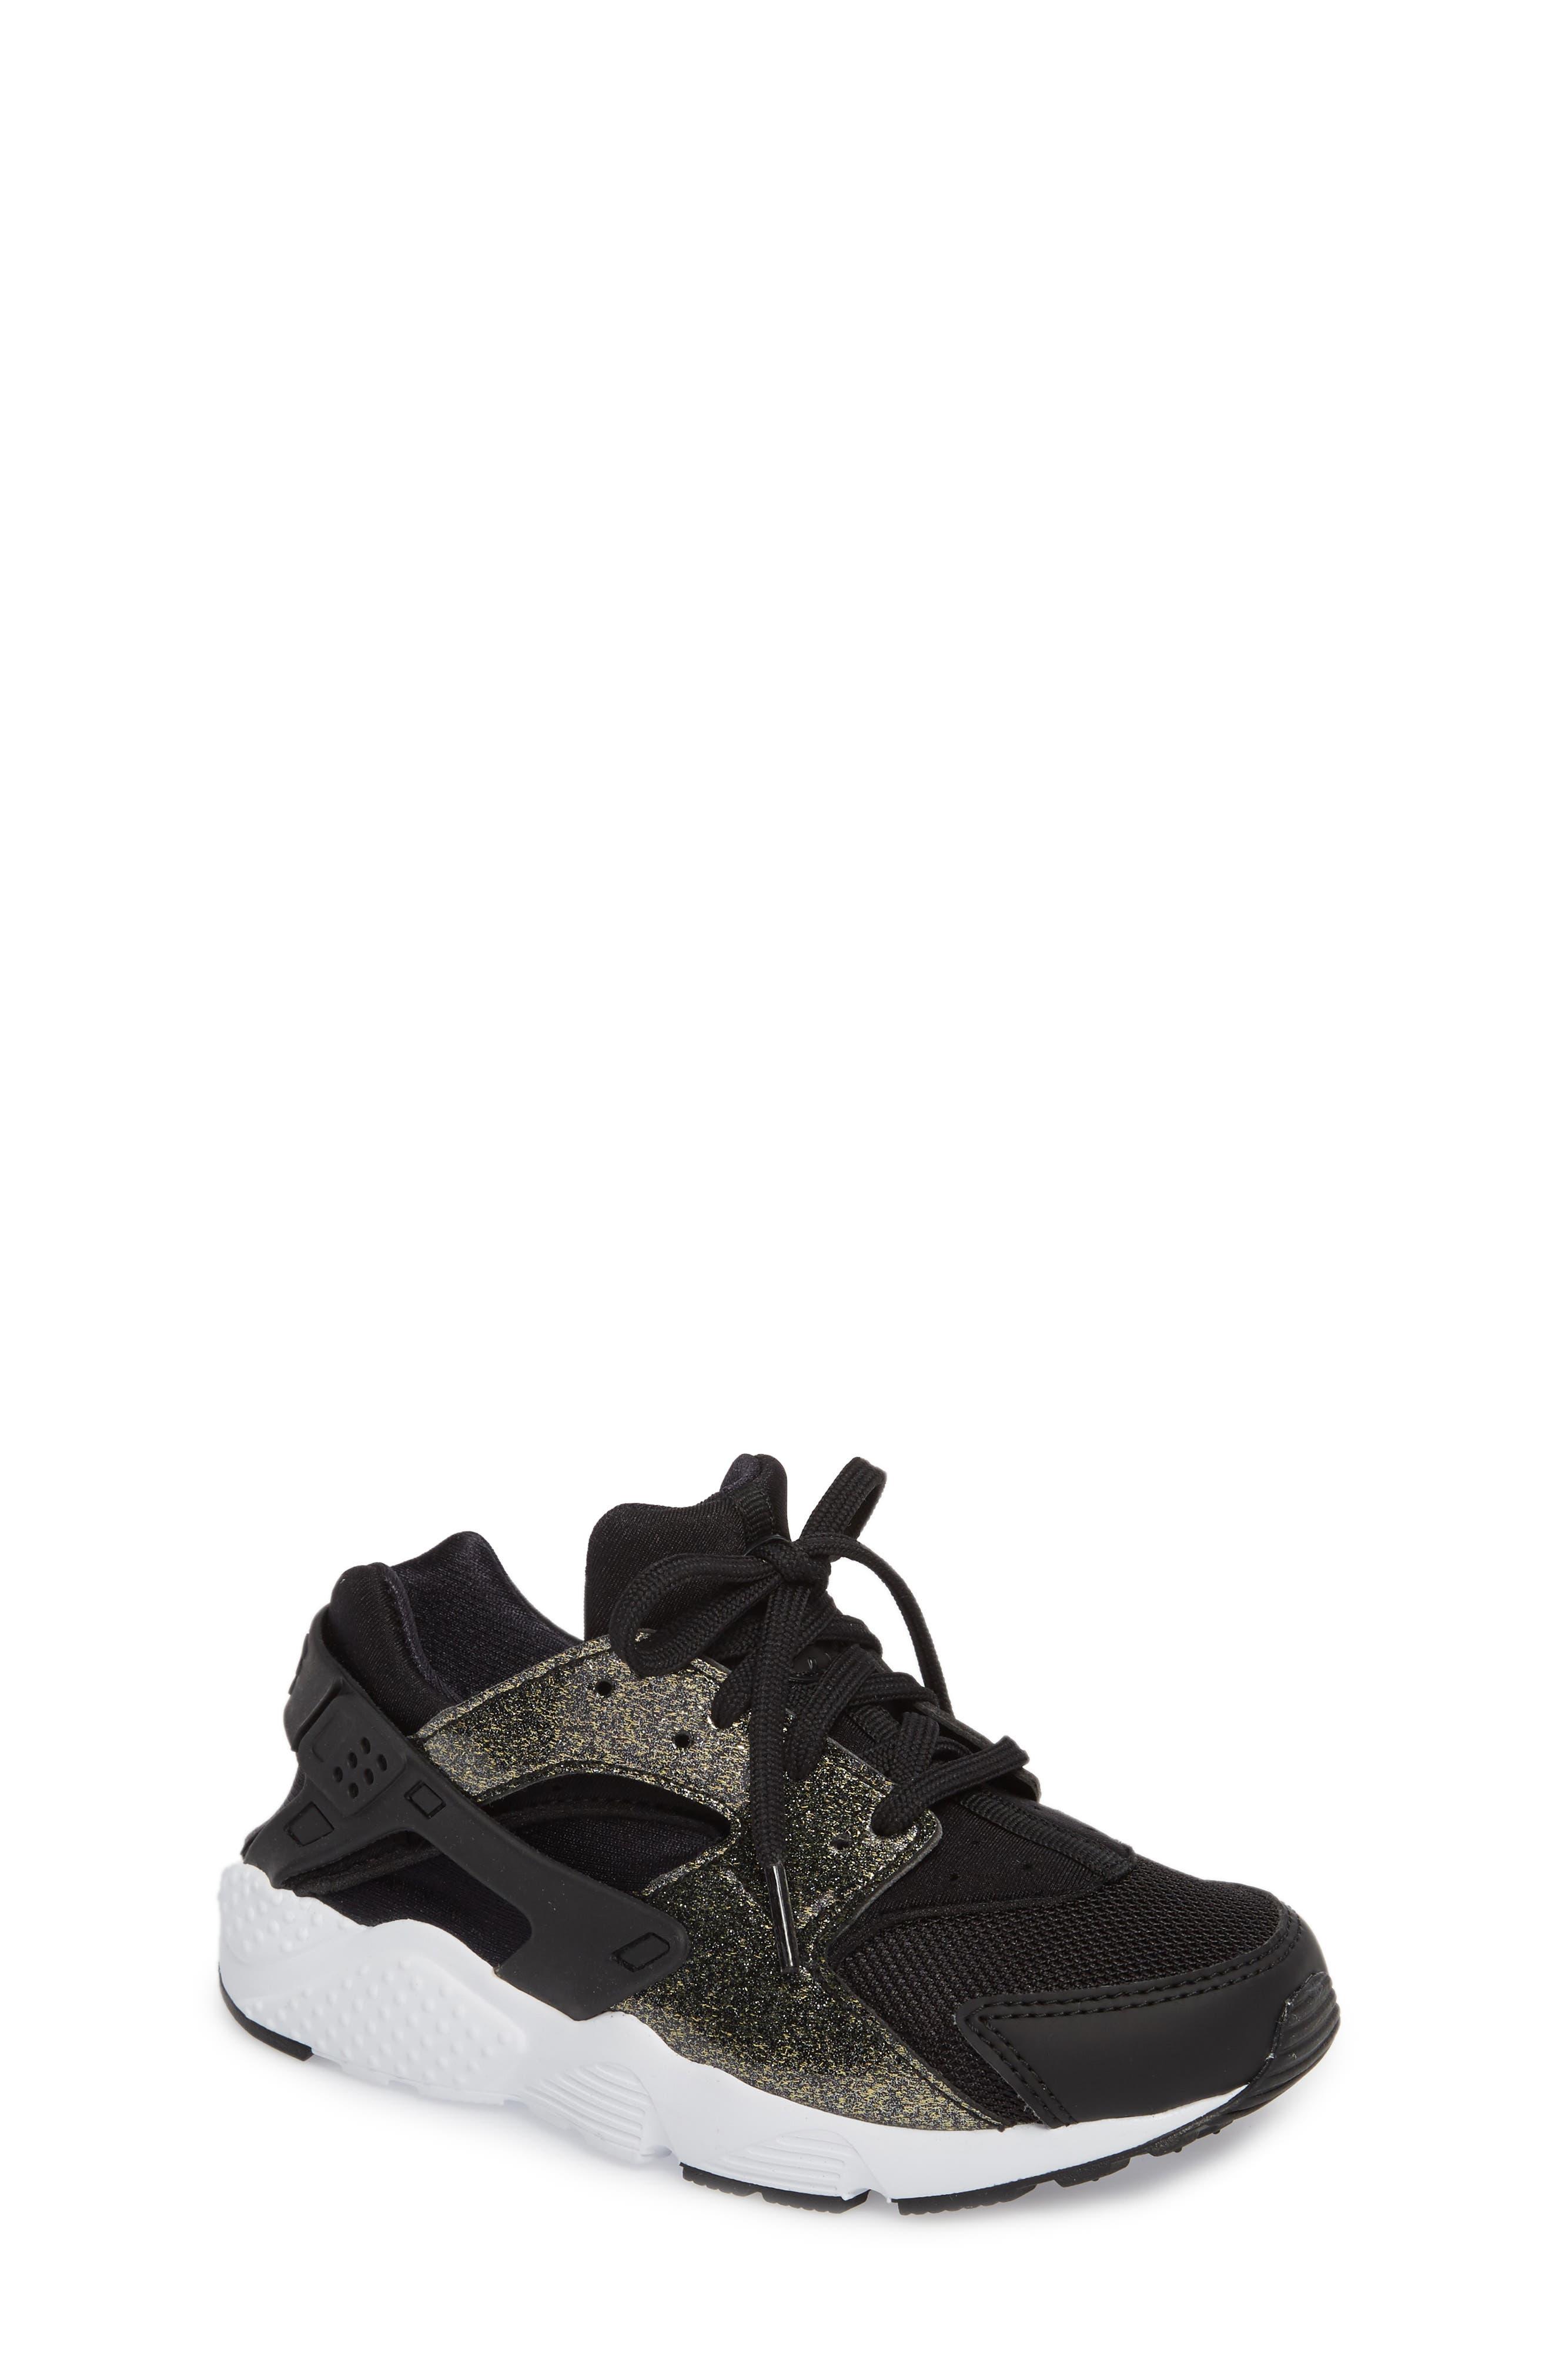 Nike Huarache Run SE Sneaker (Baby, Walker, Toddler, Little Kid & Big Kid)